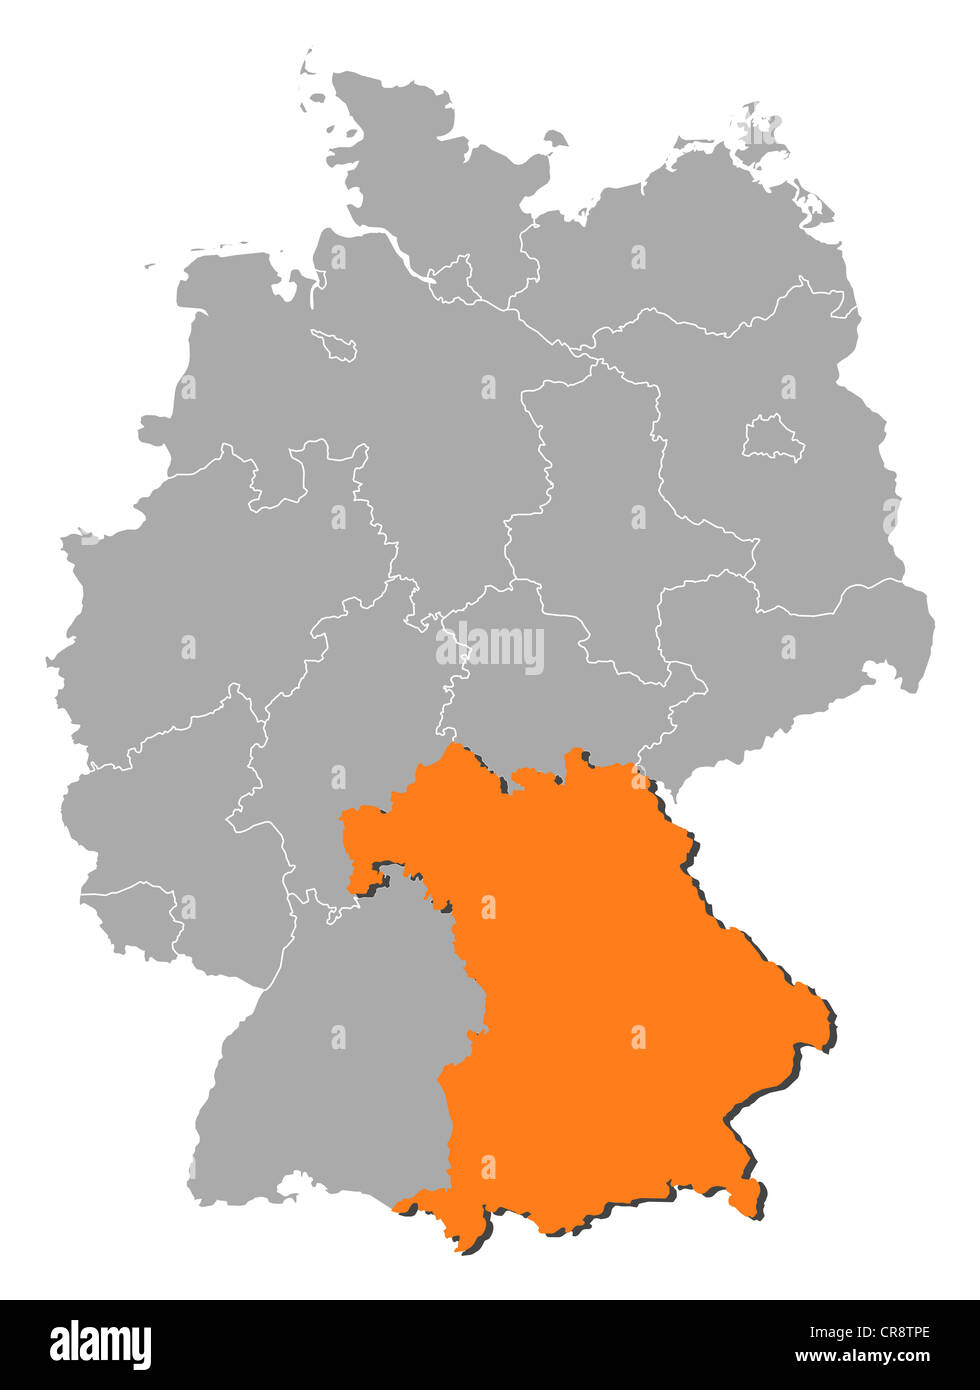 Political Map Germany Several Bavaria Stock Photos & Political Map ...